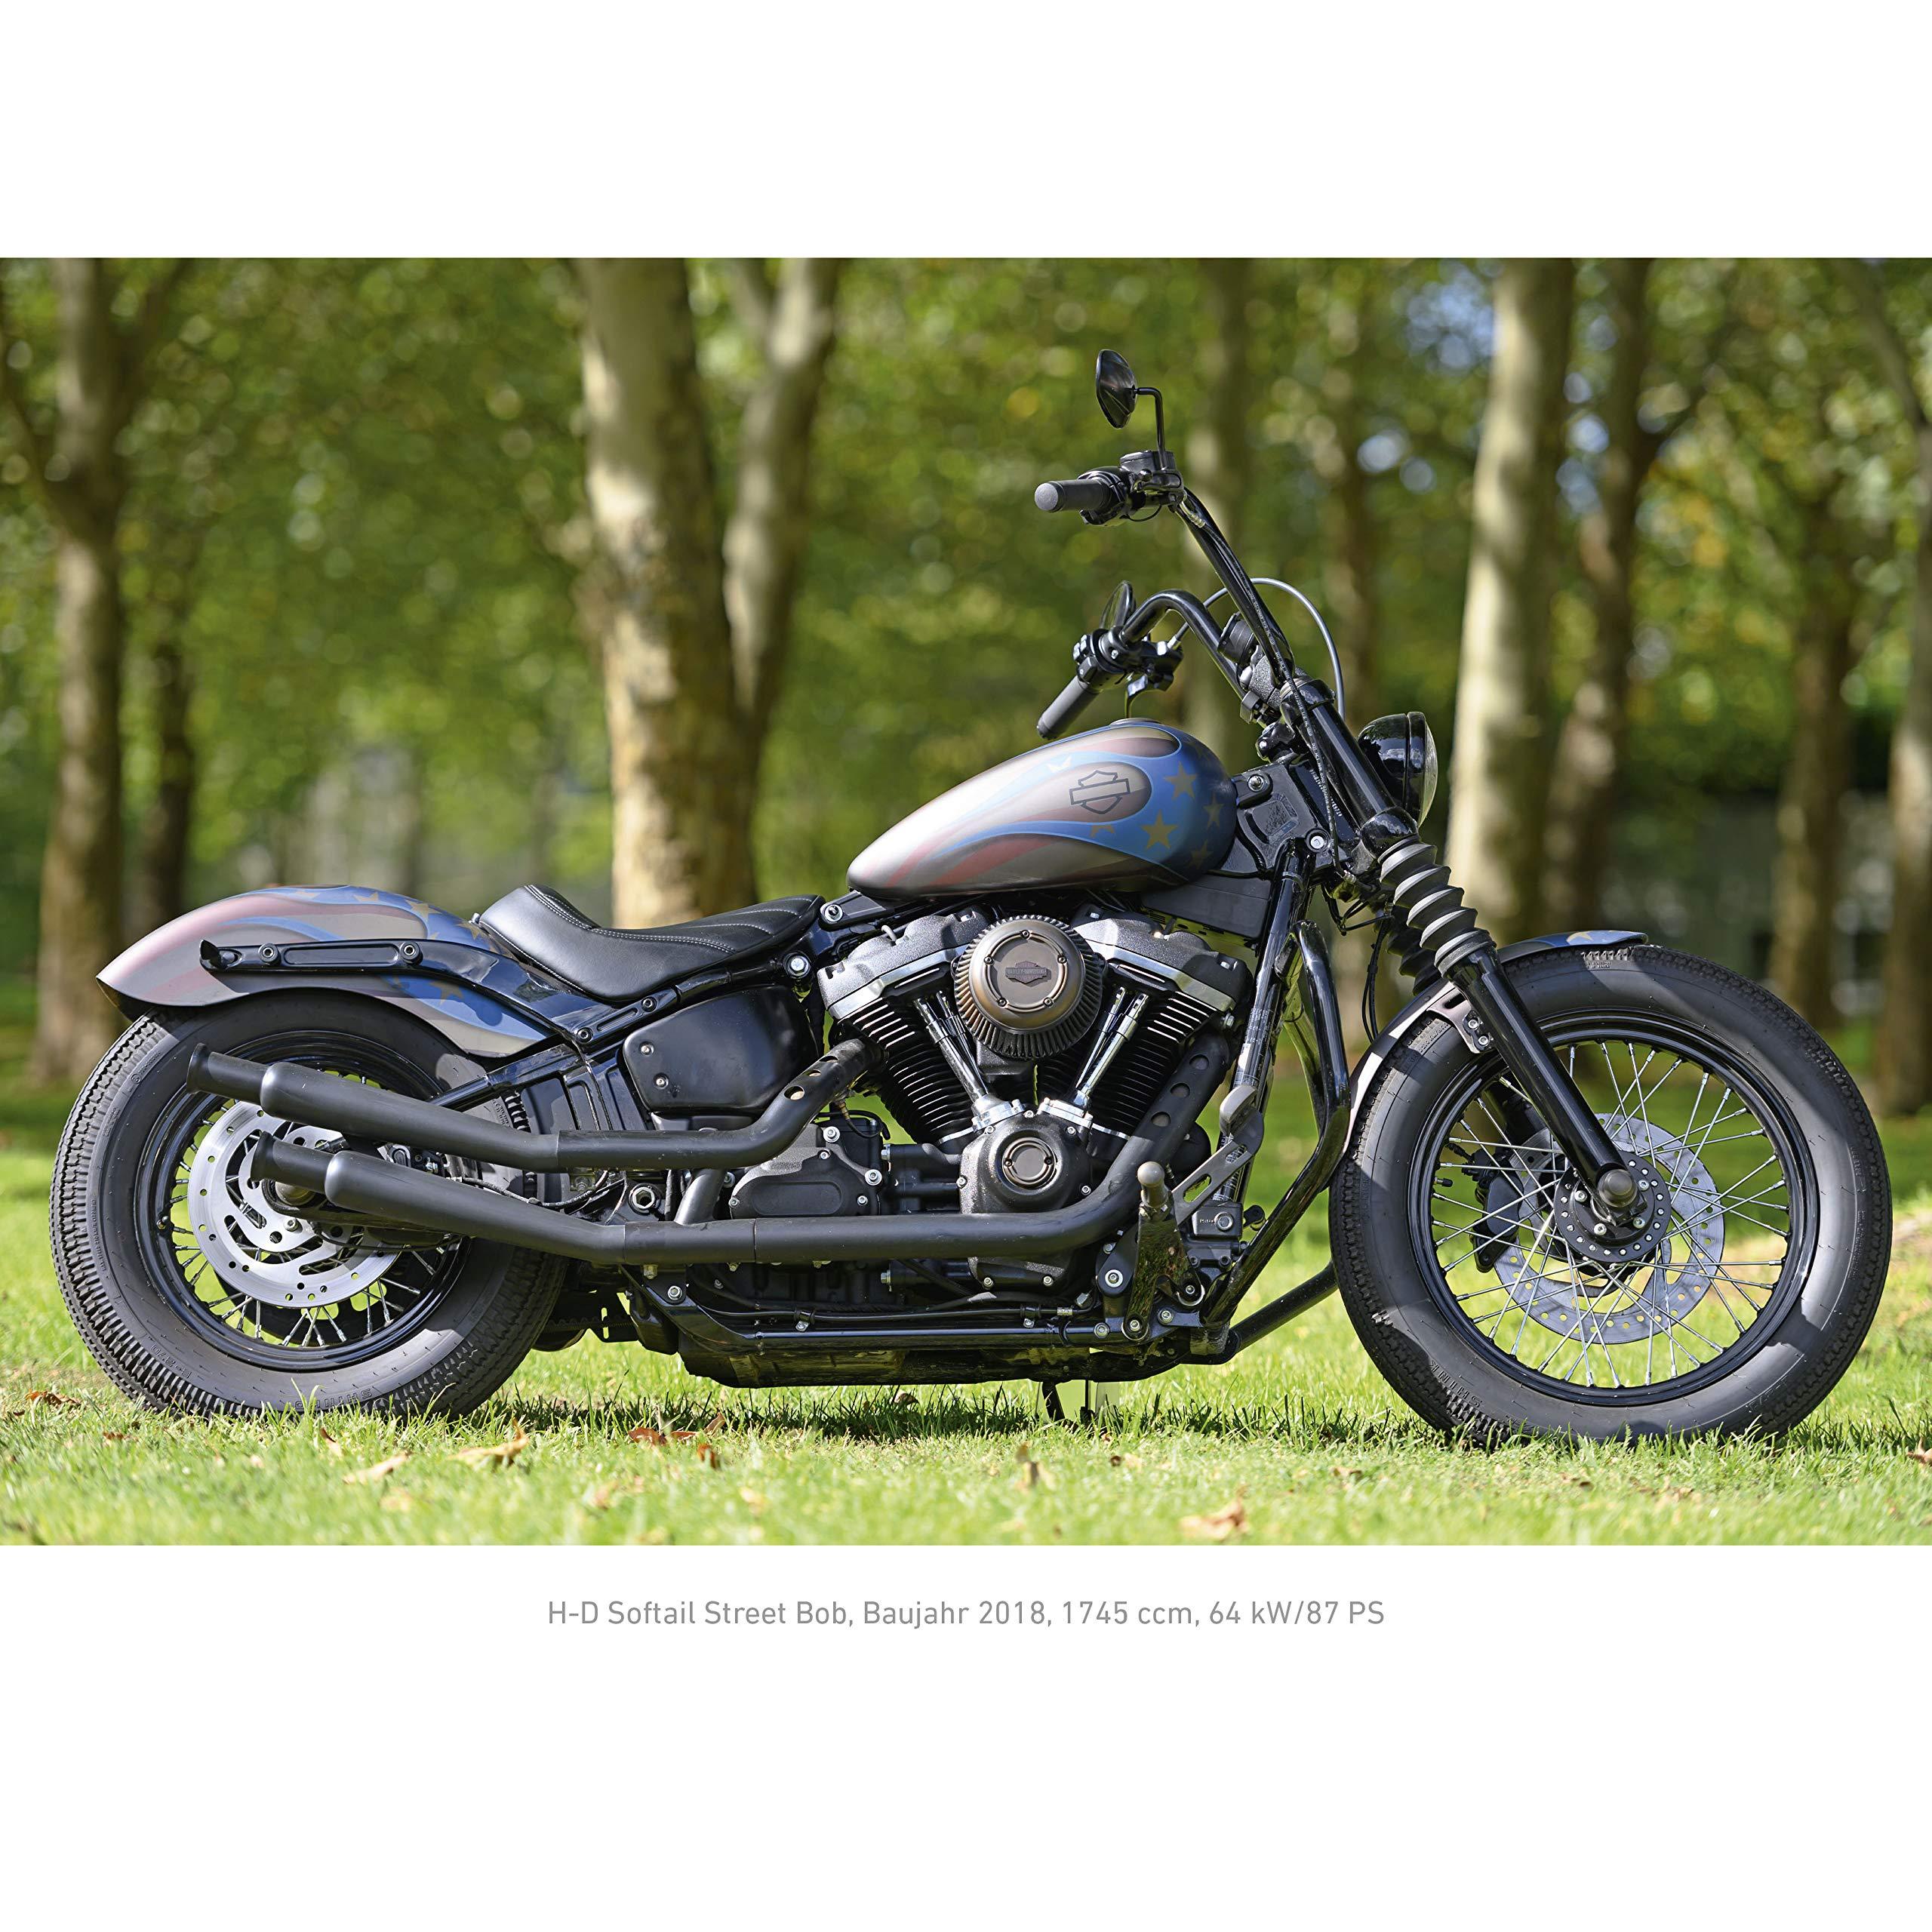 Harleys 2021 Broschurenkalender 30x30 Cm 30x60 Geoffnet Bild Kalender Christian Popkes Wandplaner Mit Platz Fur Notizen Alpha Edition Amazon De Alpha Edition Bucher